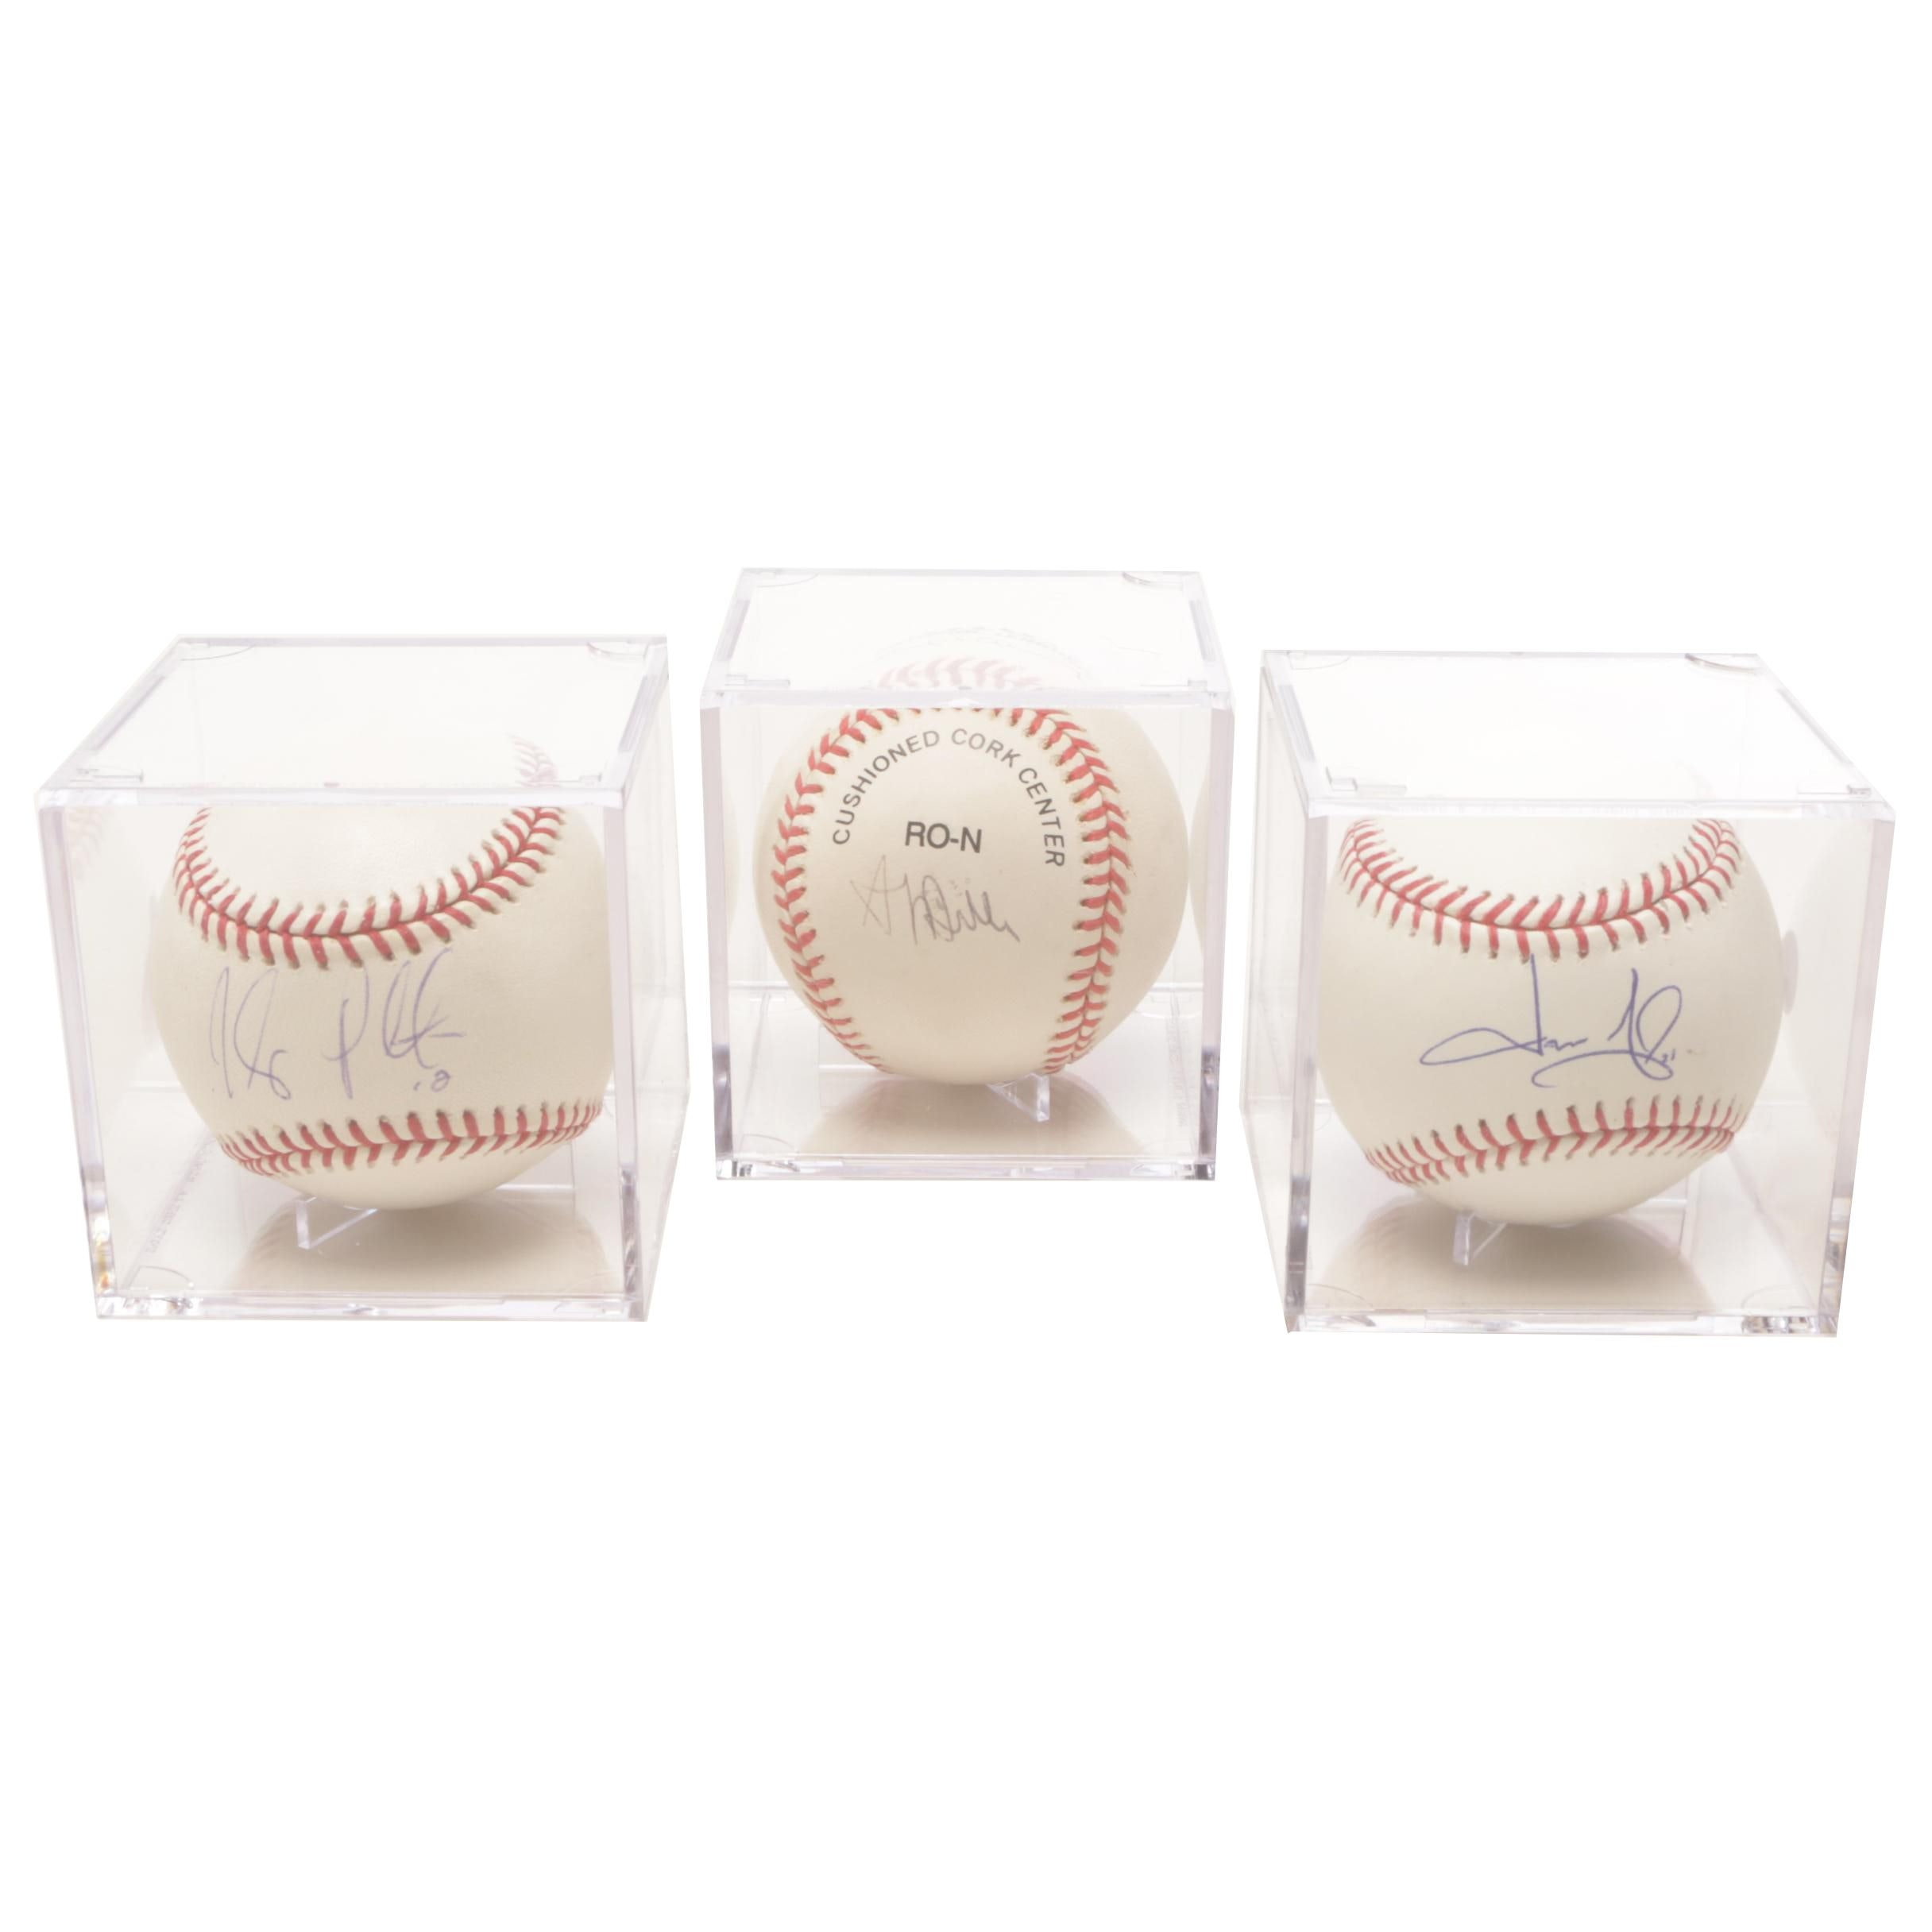 Belle, Giambi, and Peralta Signed Rawlings Major League Baseballs